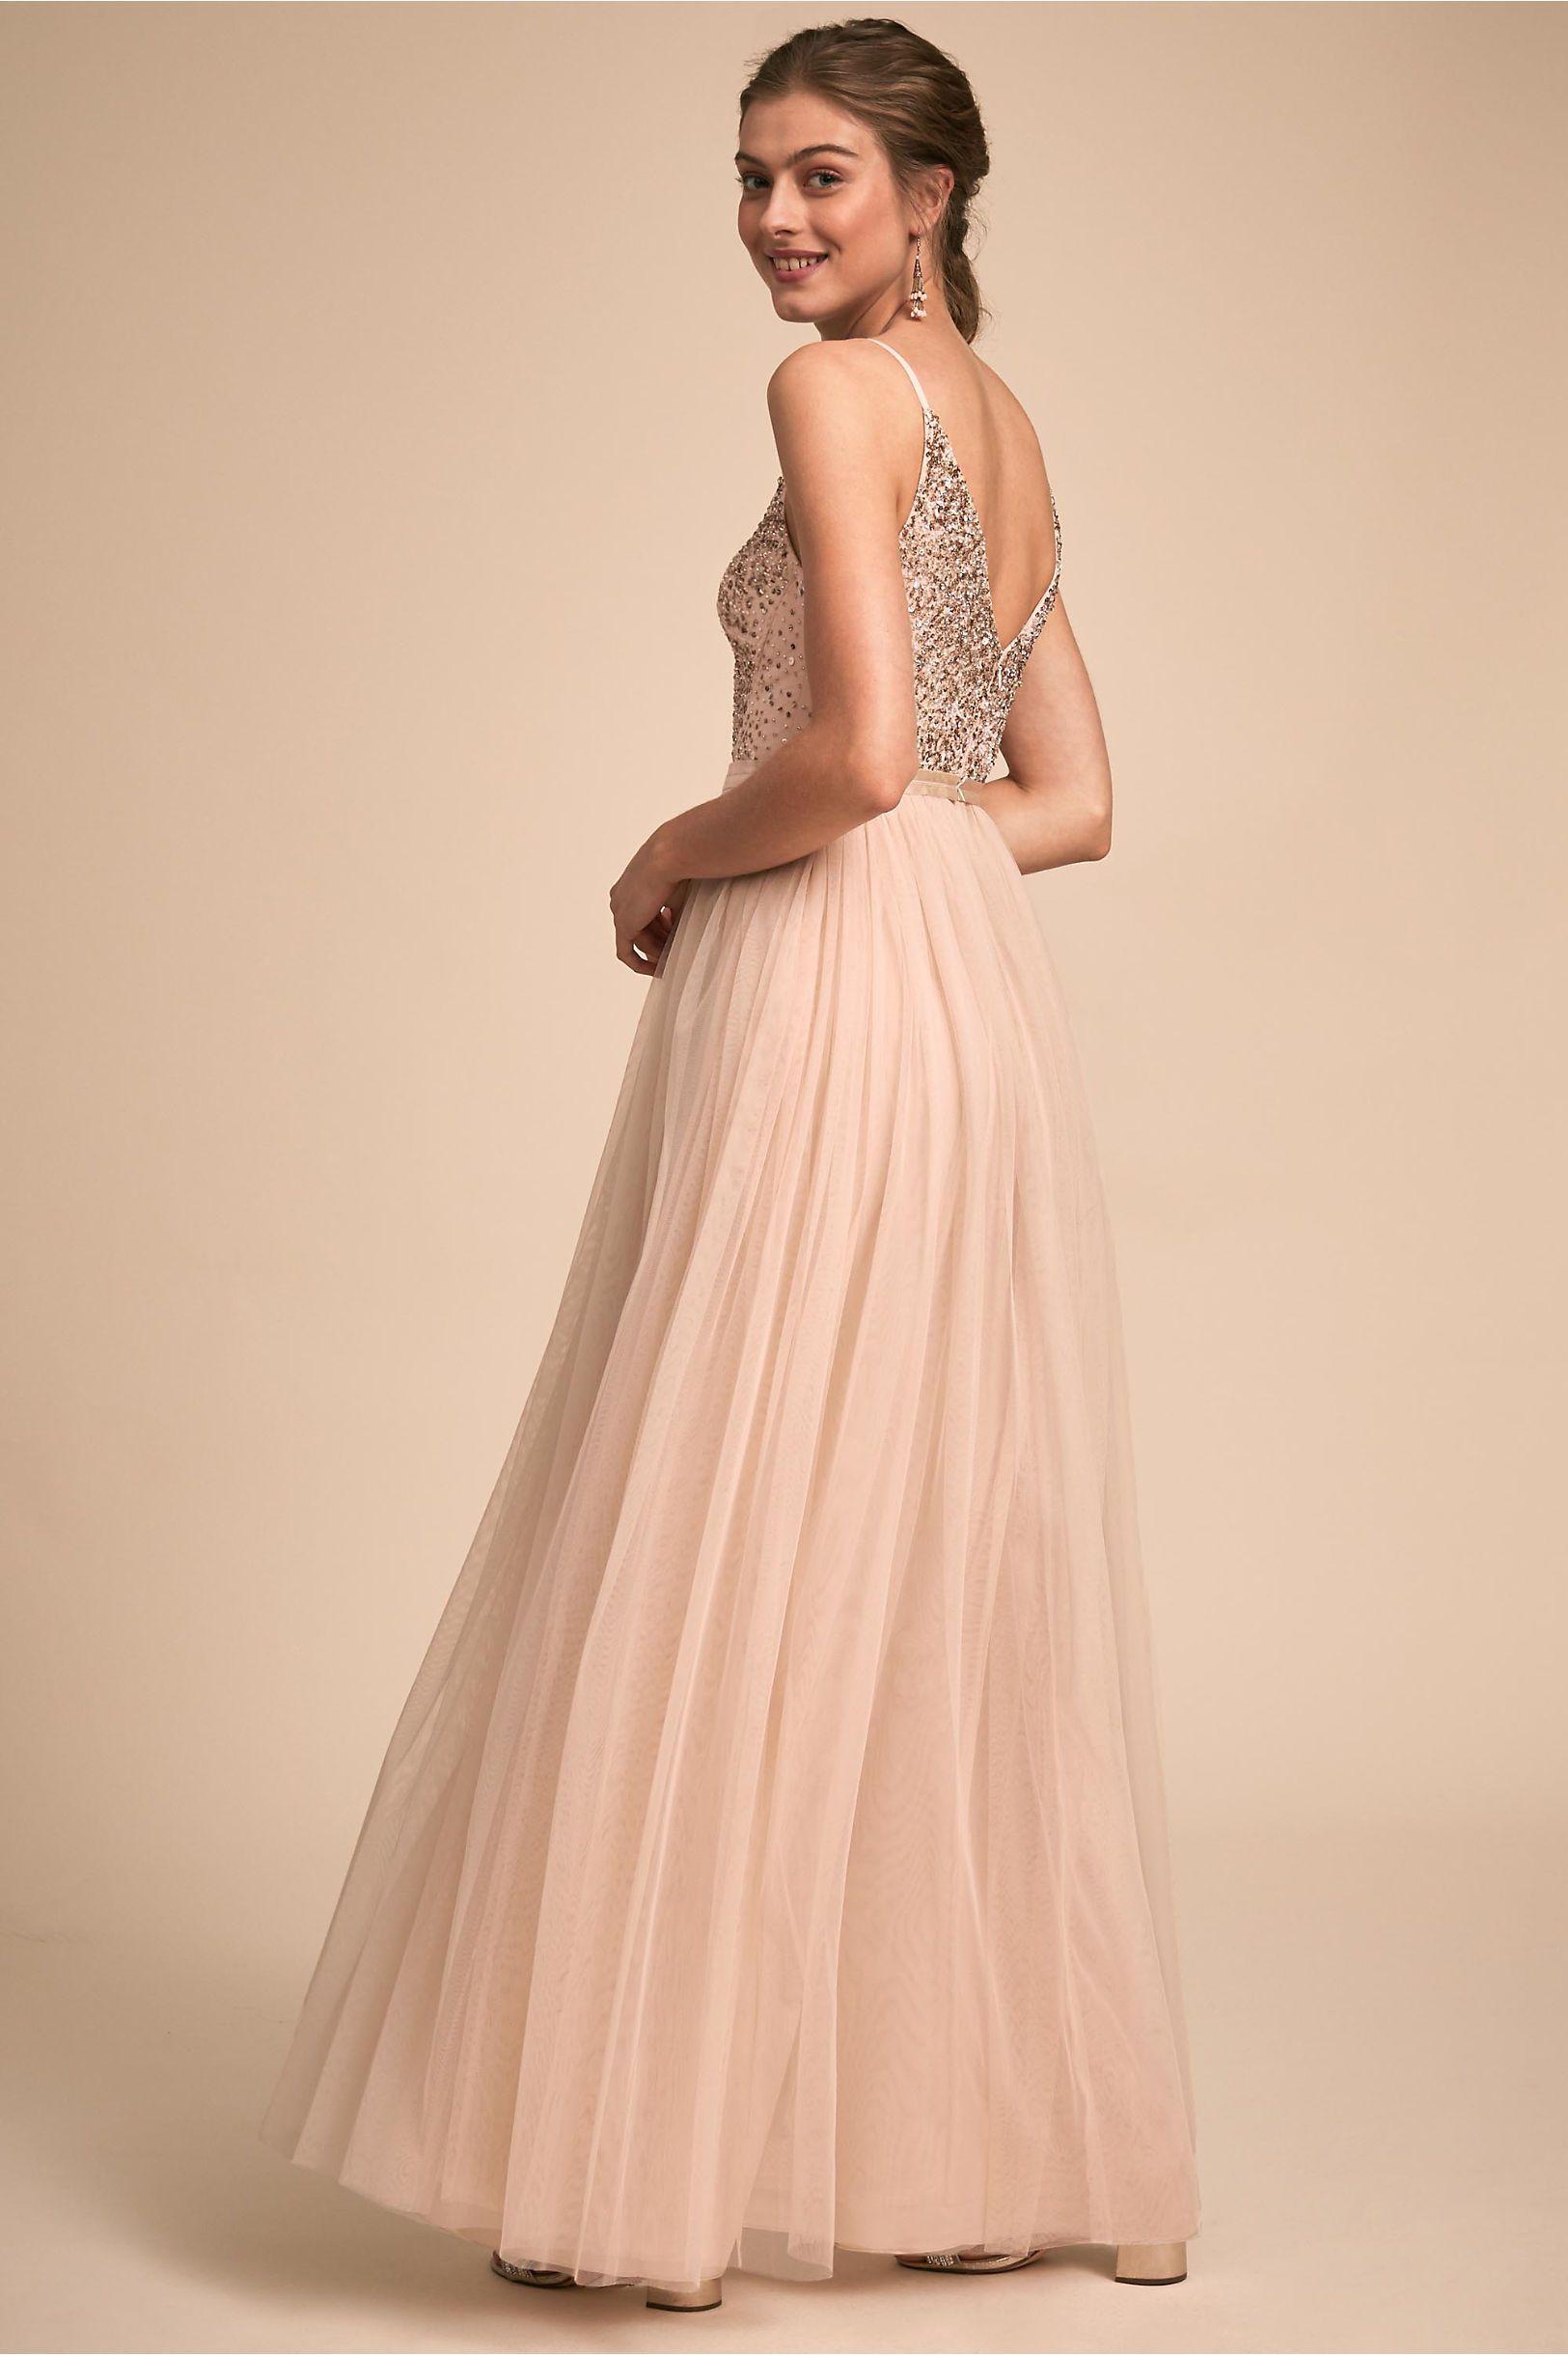 97502505298 Avery Dress Oyster in Bride